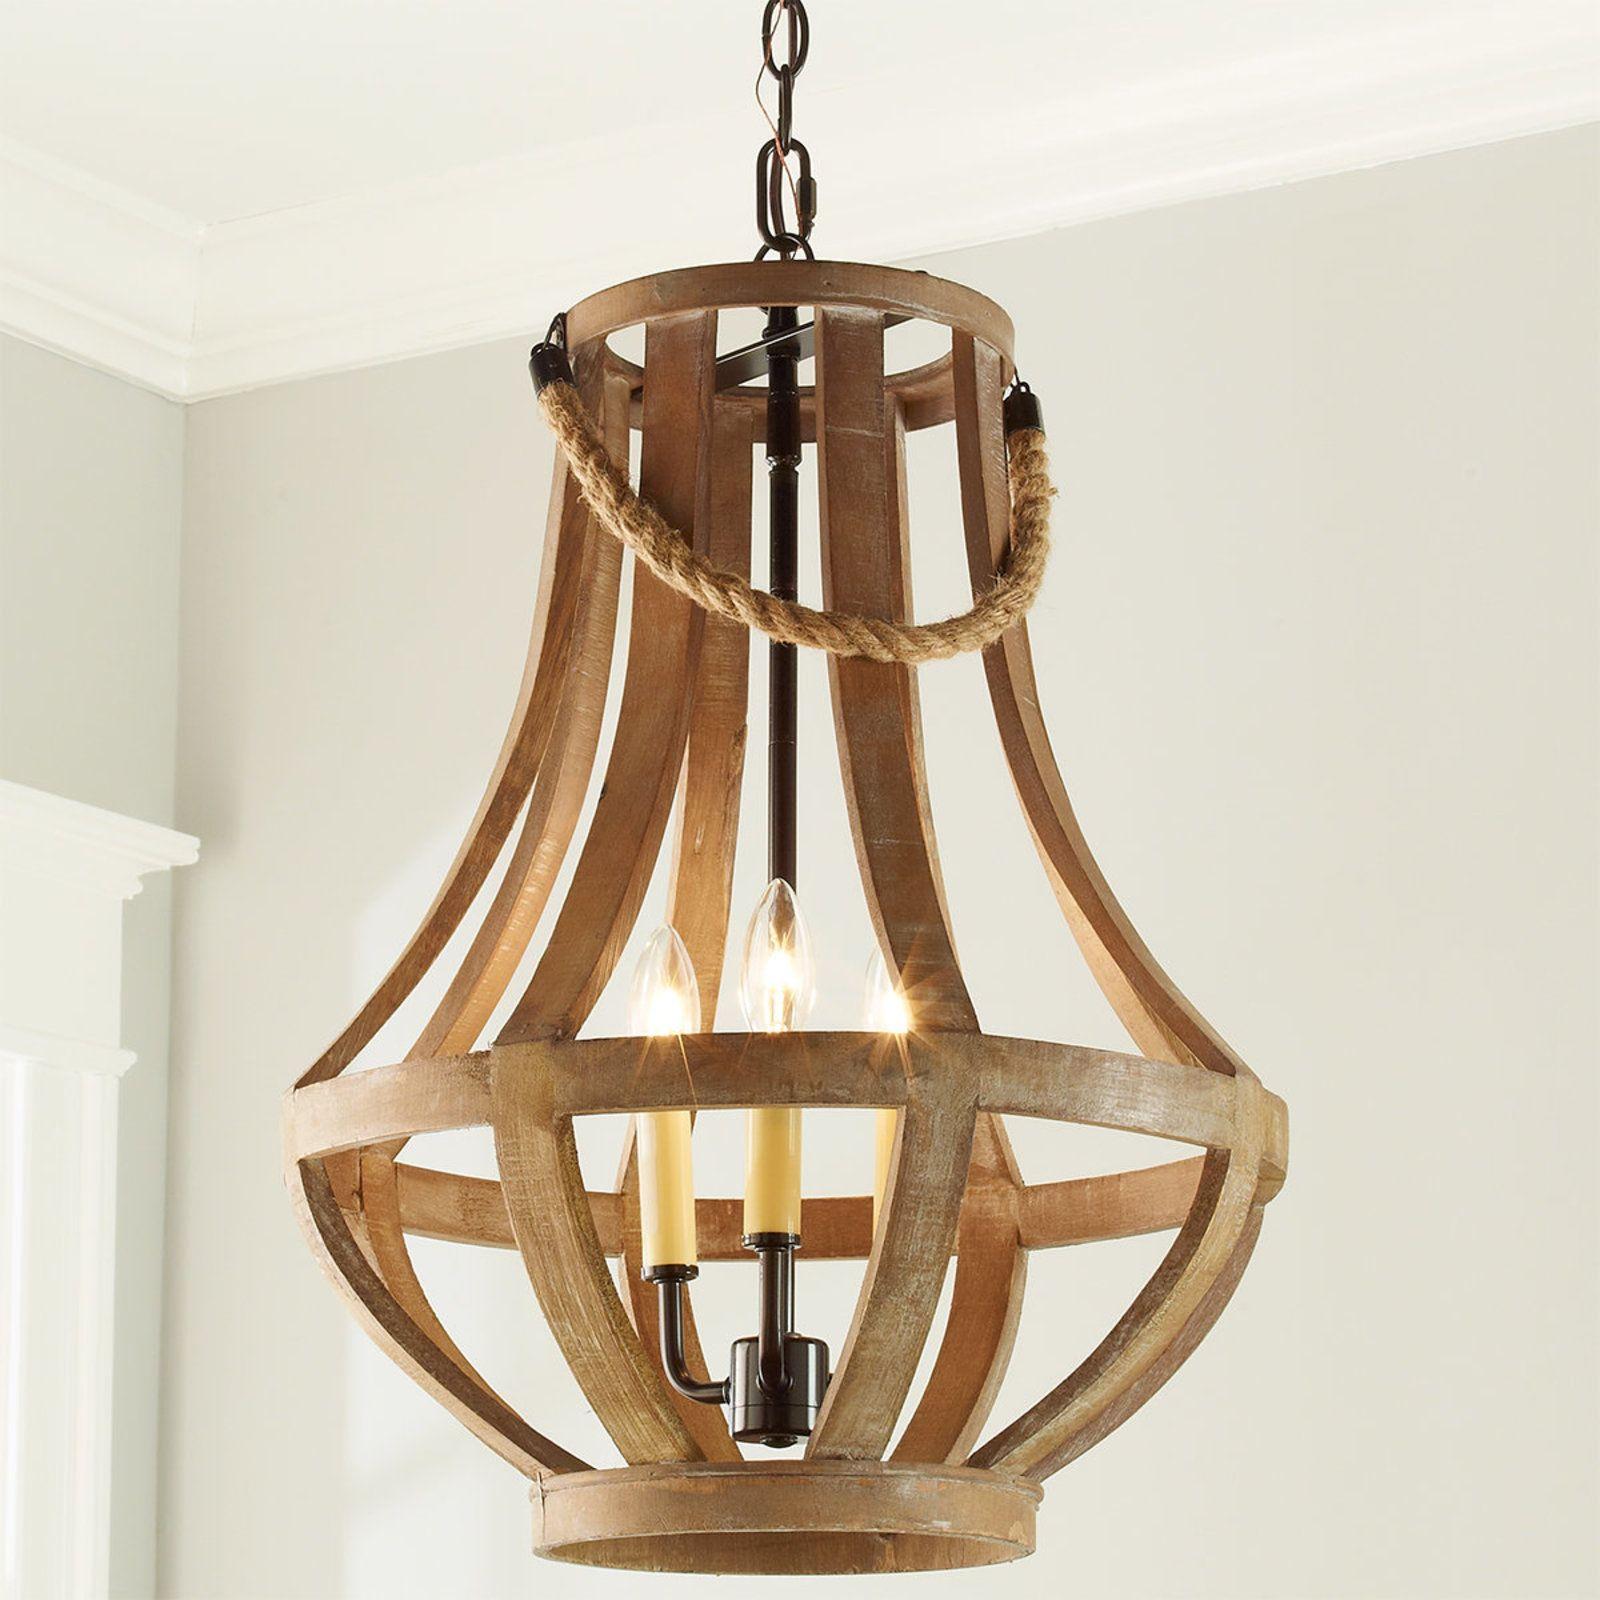 Rustic Wood Basket Lantern Small Wood Chandelier Rustic